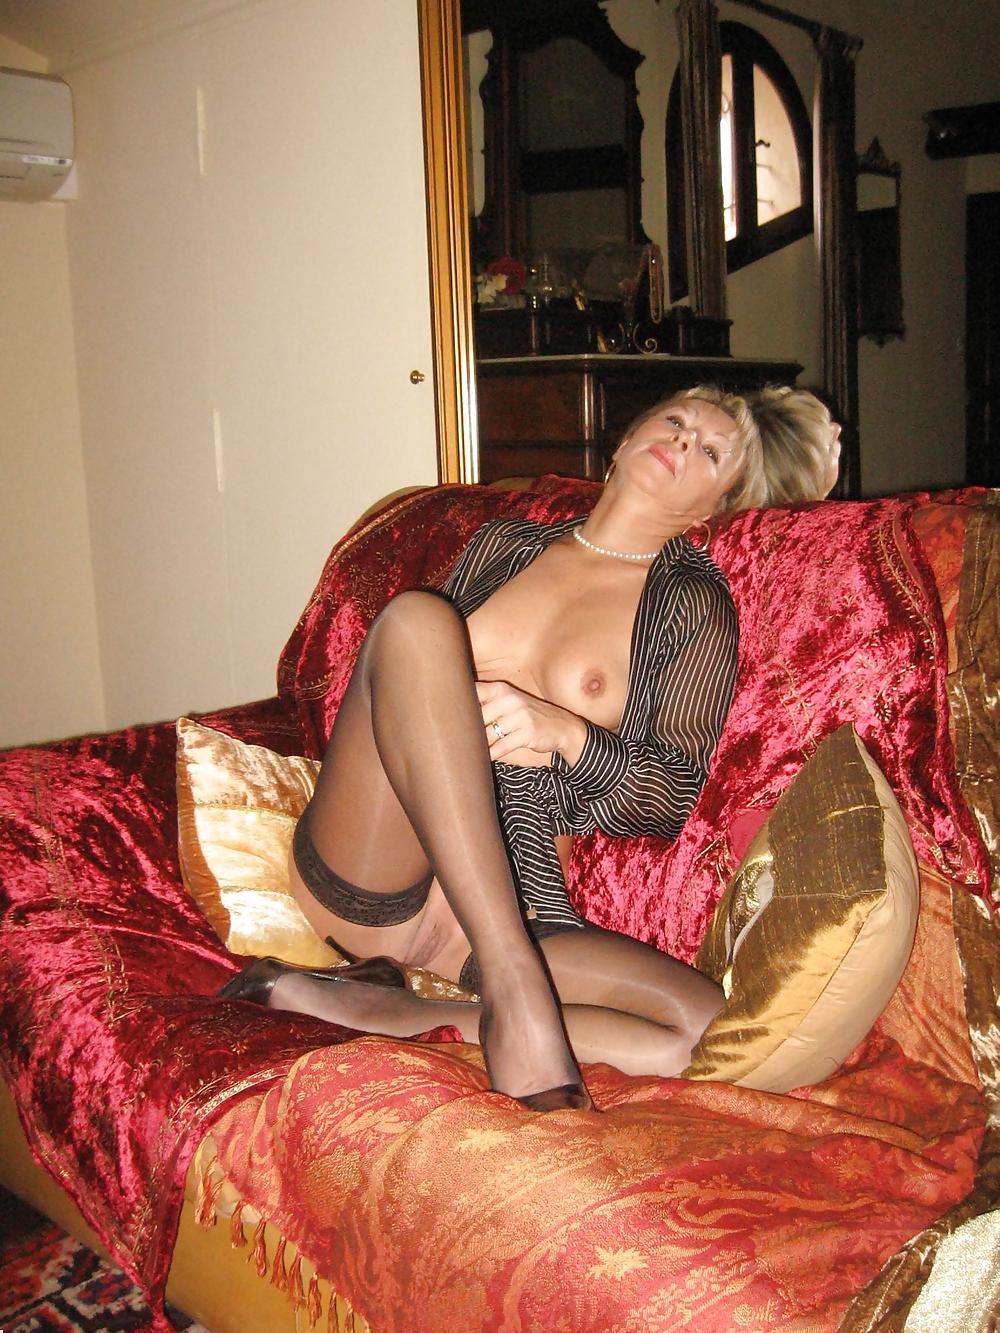 http://hotamateurmature.com/gallery/Housewives_milf_mature_elders/96.jpg